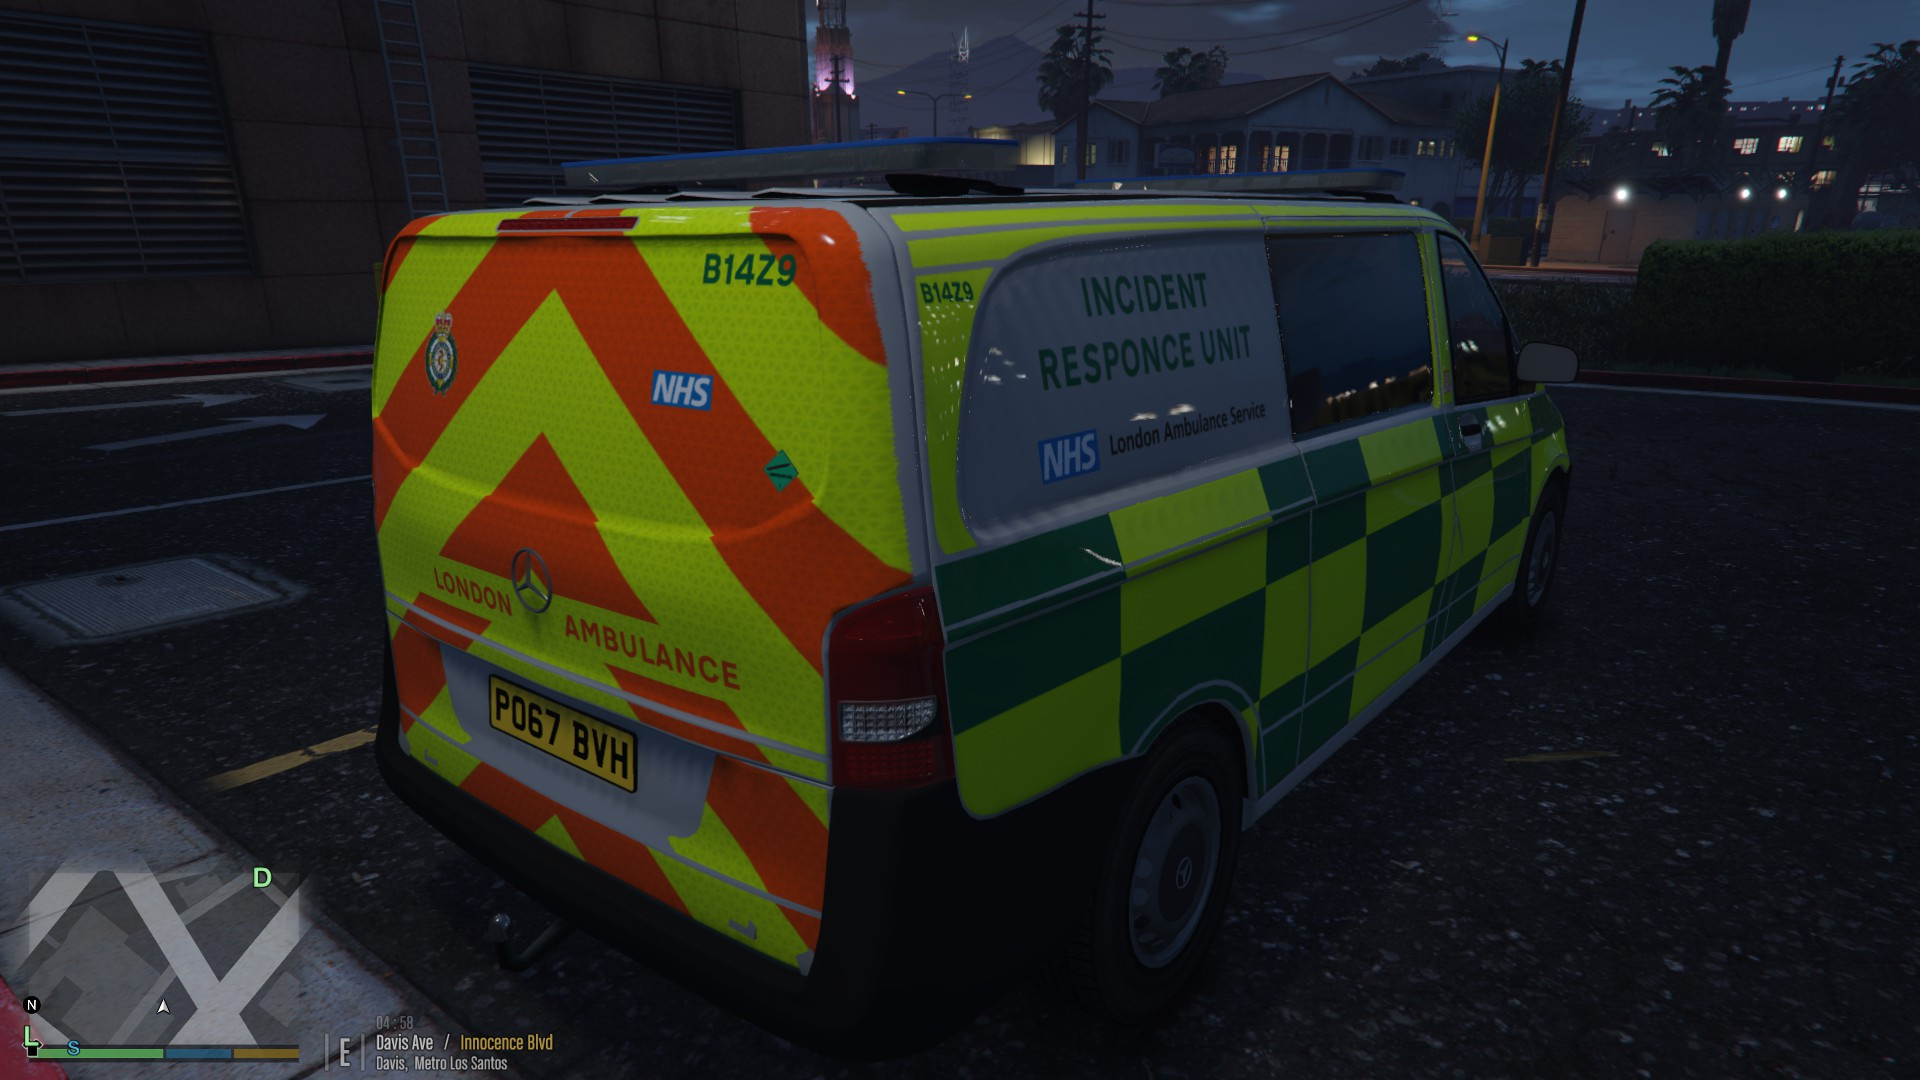 Mercedes London Ambulance Service Incident Response Unit - GTA5-Mods.com